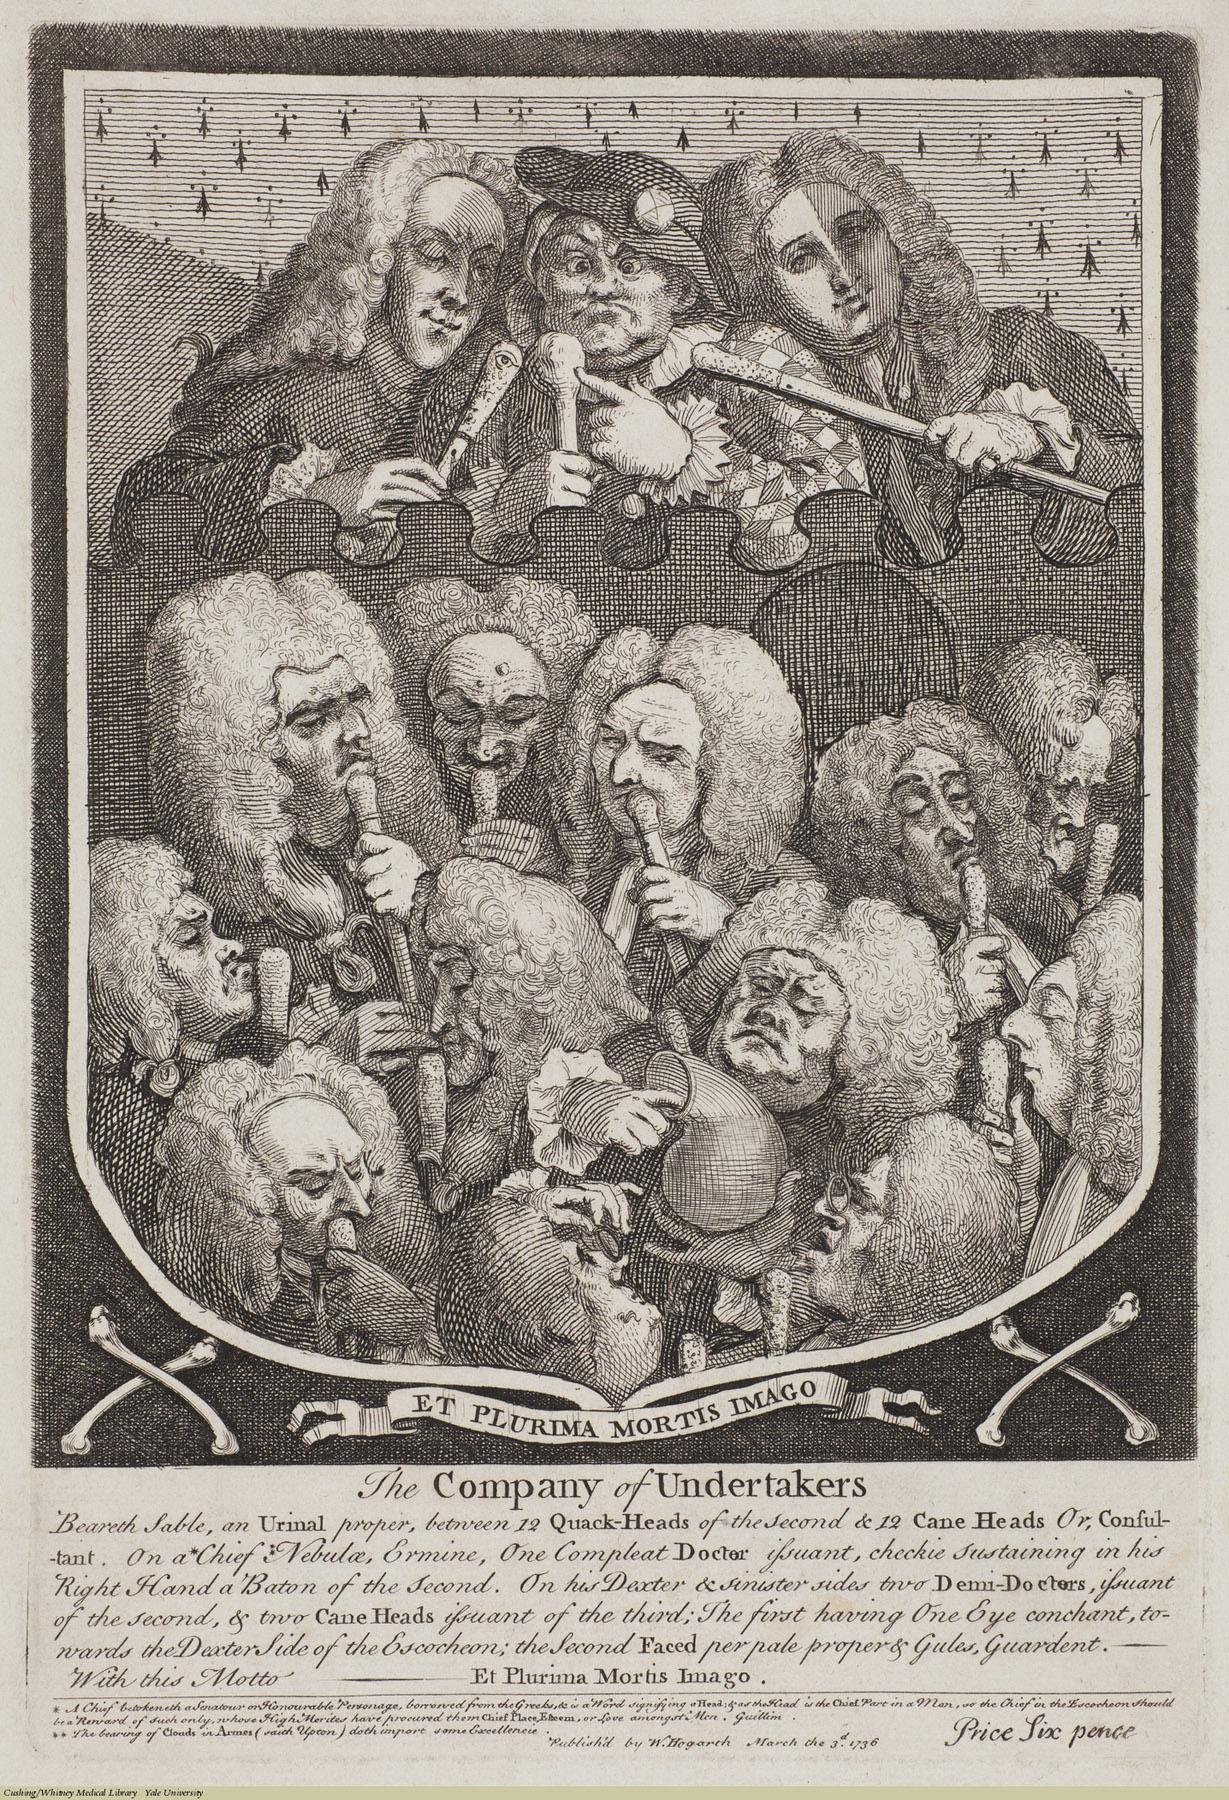 The Company of Undertakers. William Hogarth, Laid, 1736. Subject: Mapp, Sarah (d.1736), Taylor, John (1703-72), Ward, Joshua (1685-1761), Dod, Pierce (1683-1754), Bamber, Dr., Quacks & quackery.